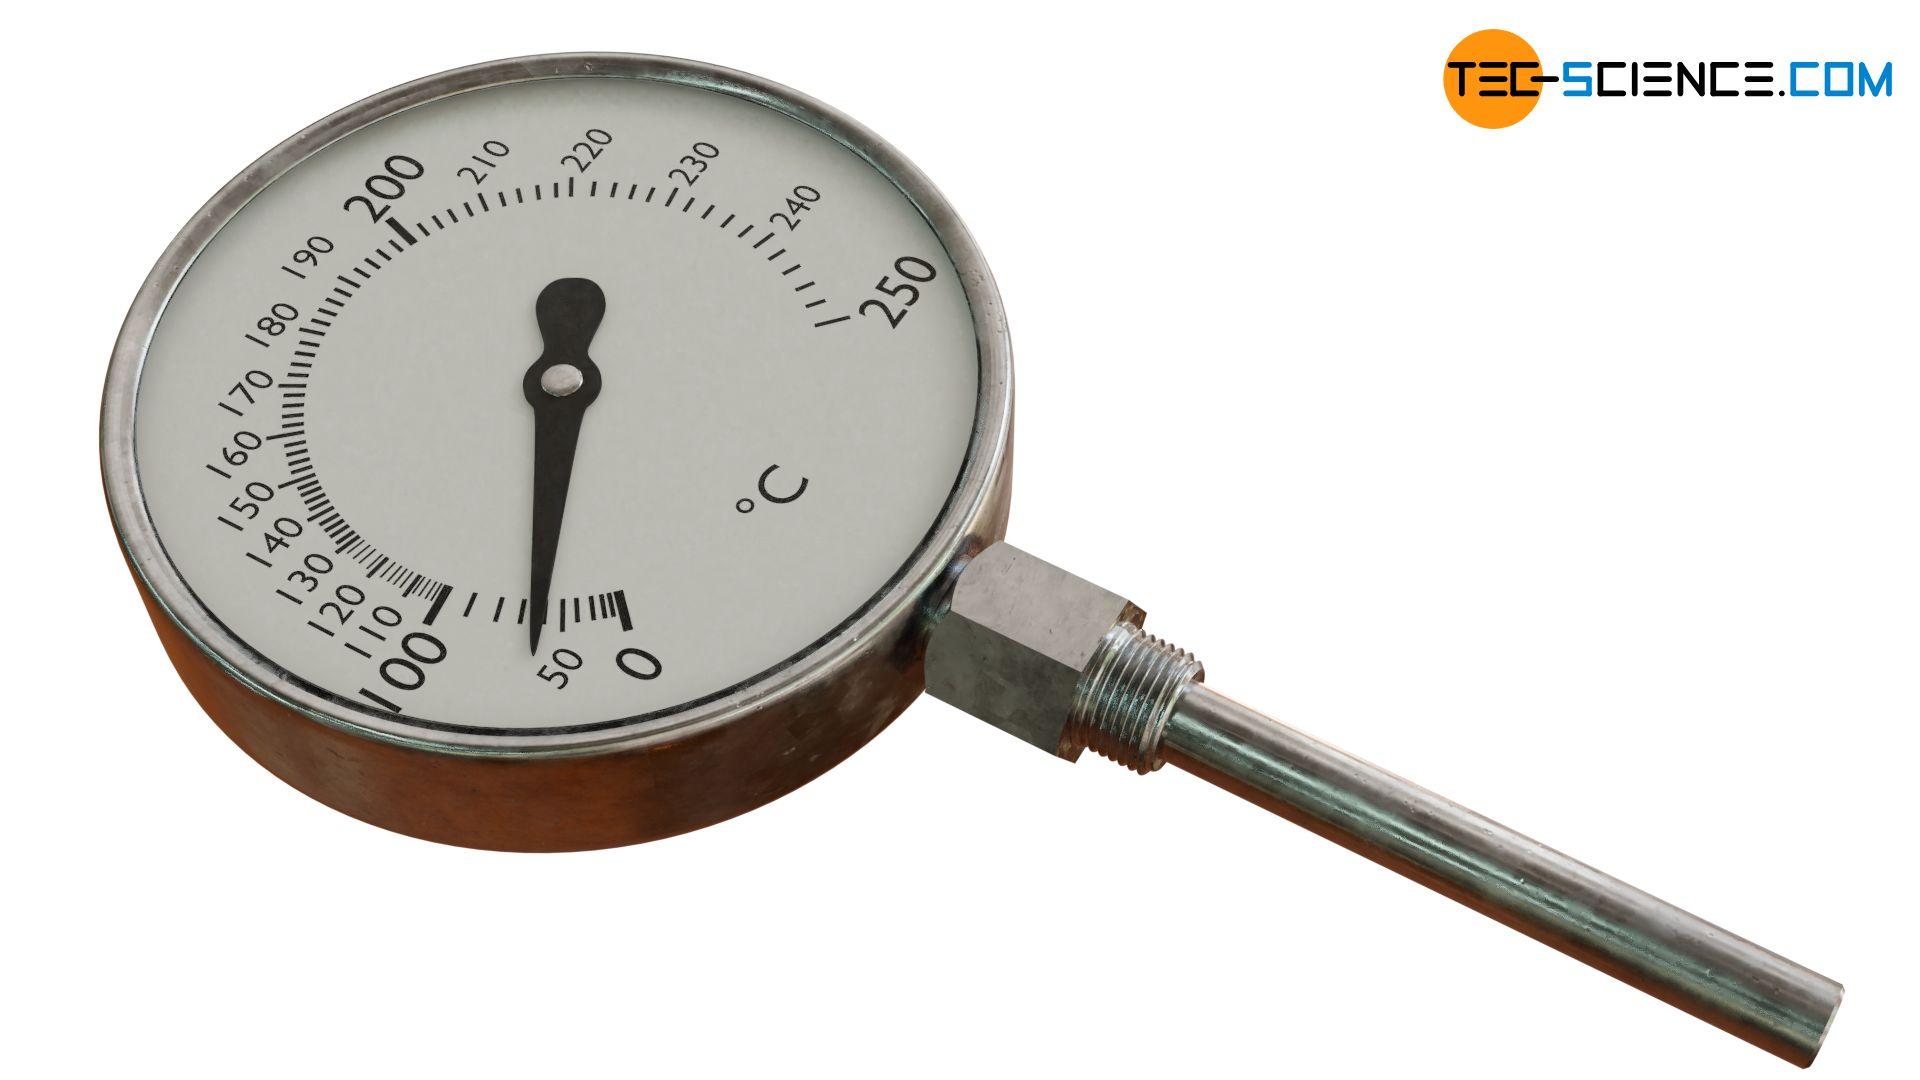 Dampfdruck-Federthermometer